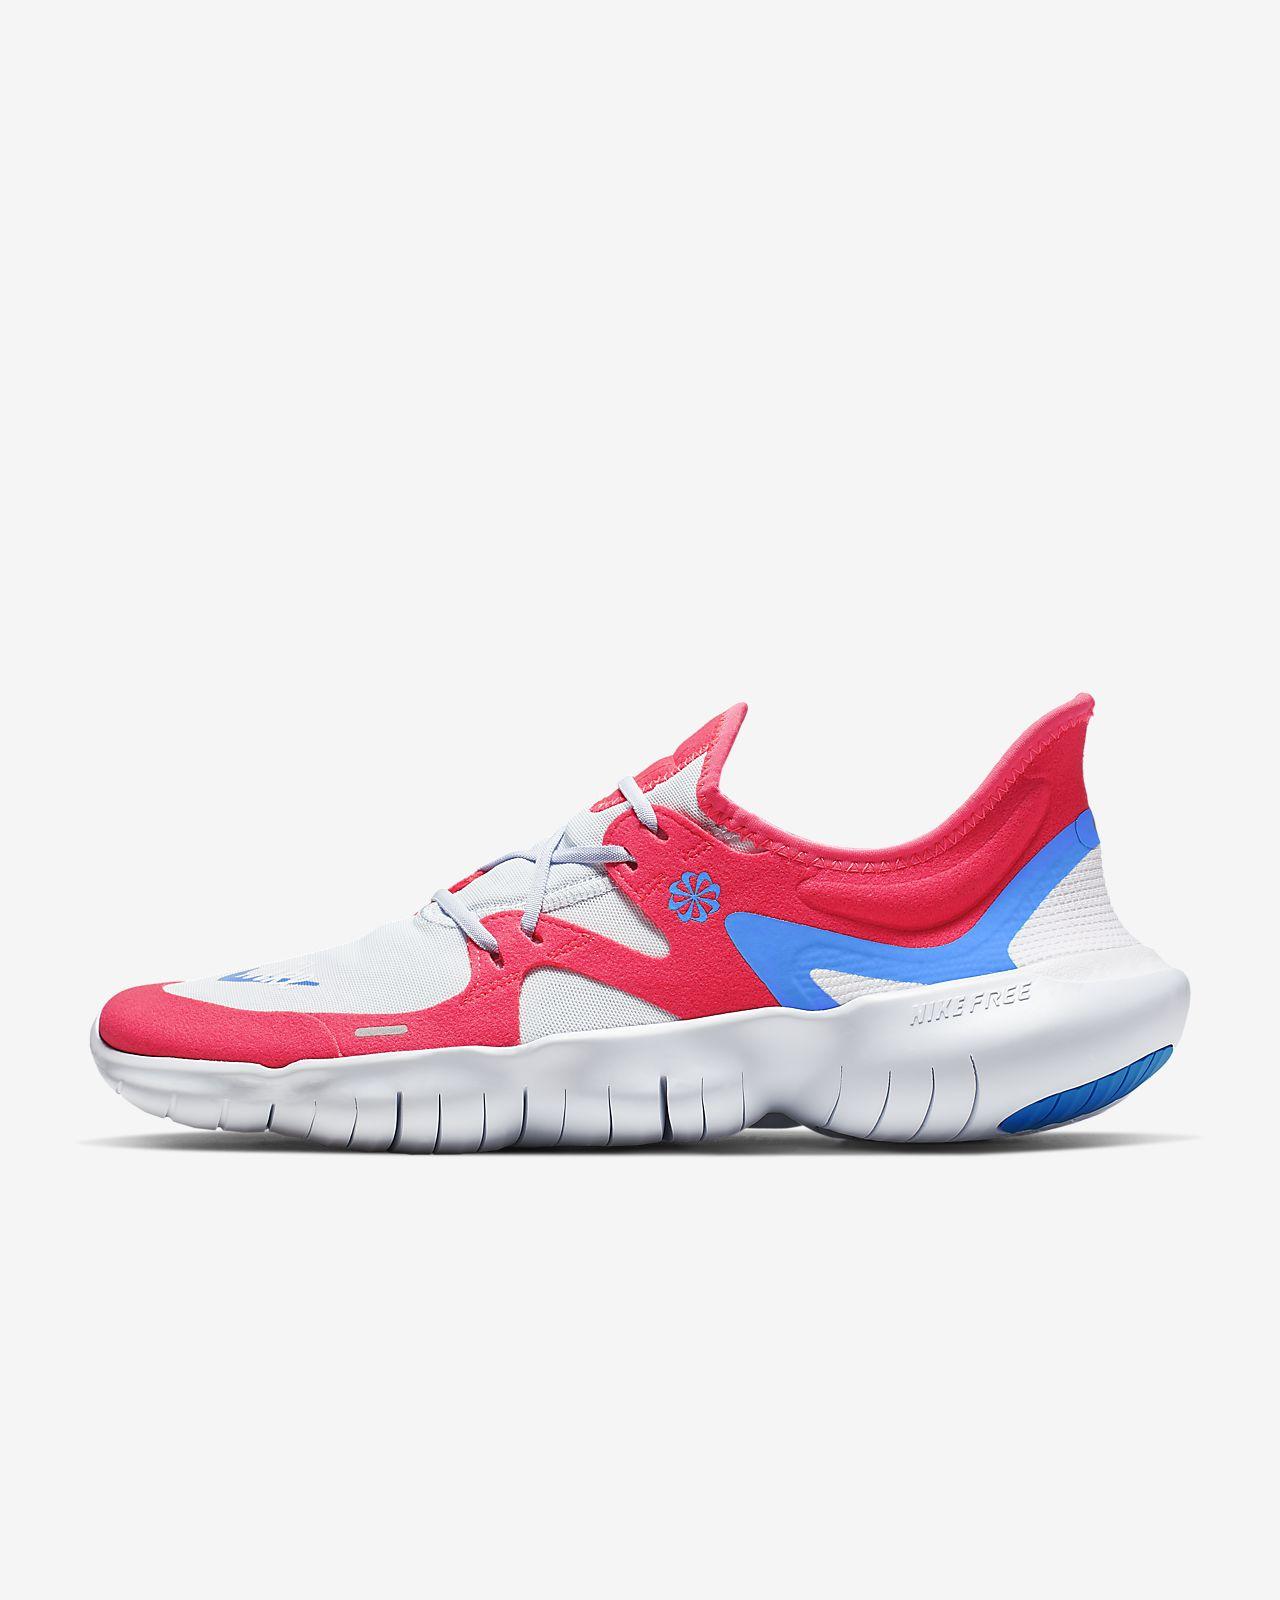 scarpe nike bambino saldi, Scarpe Nike Running Free 5.0 V2